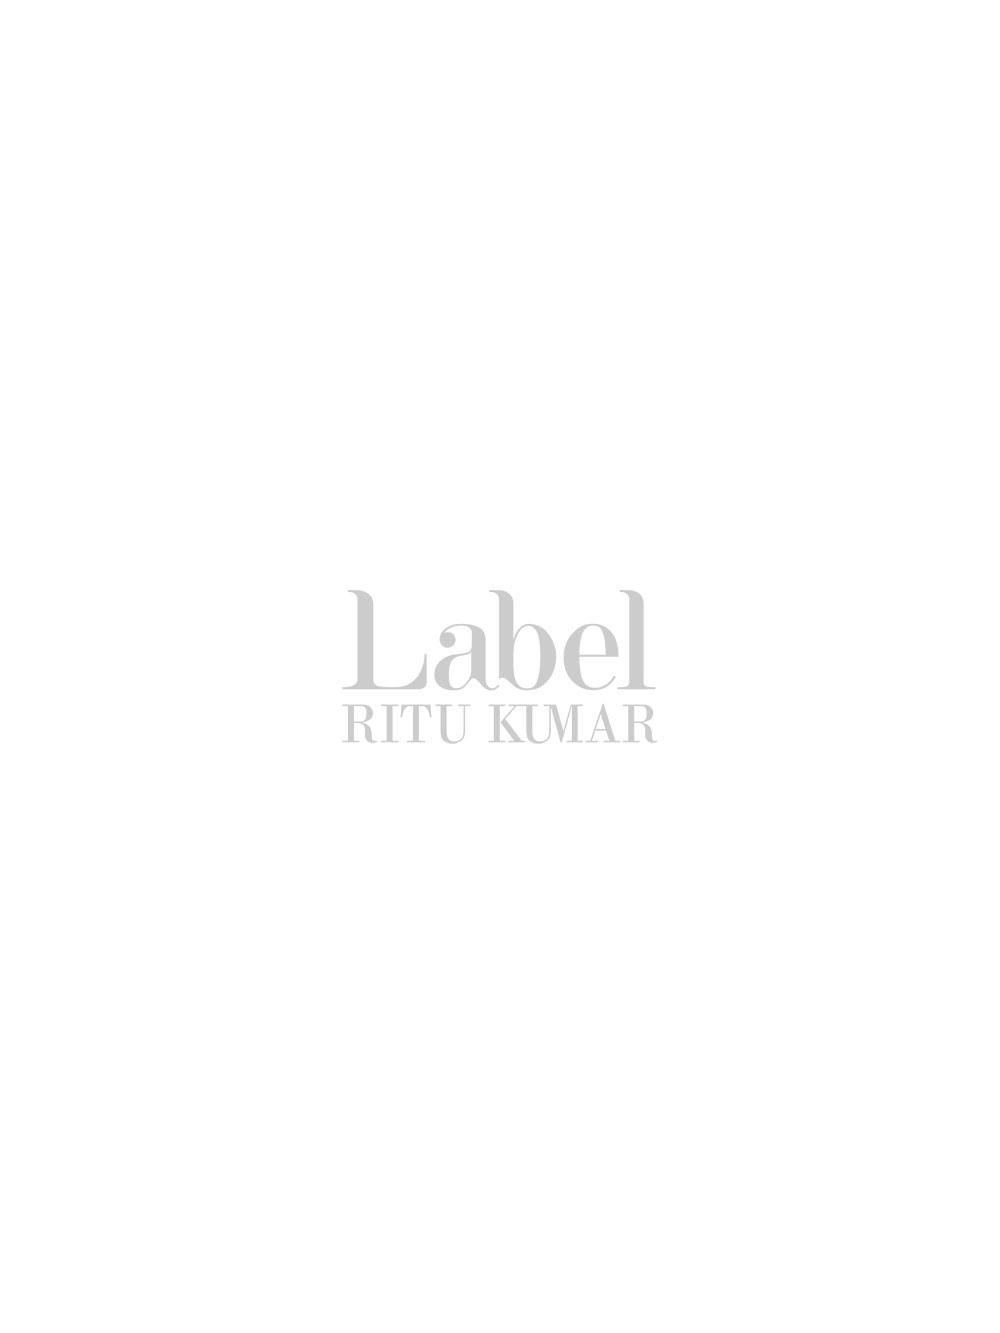 Slate Grey Blouson Short Dress by Label Ritu Kumar